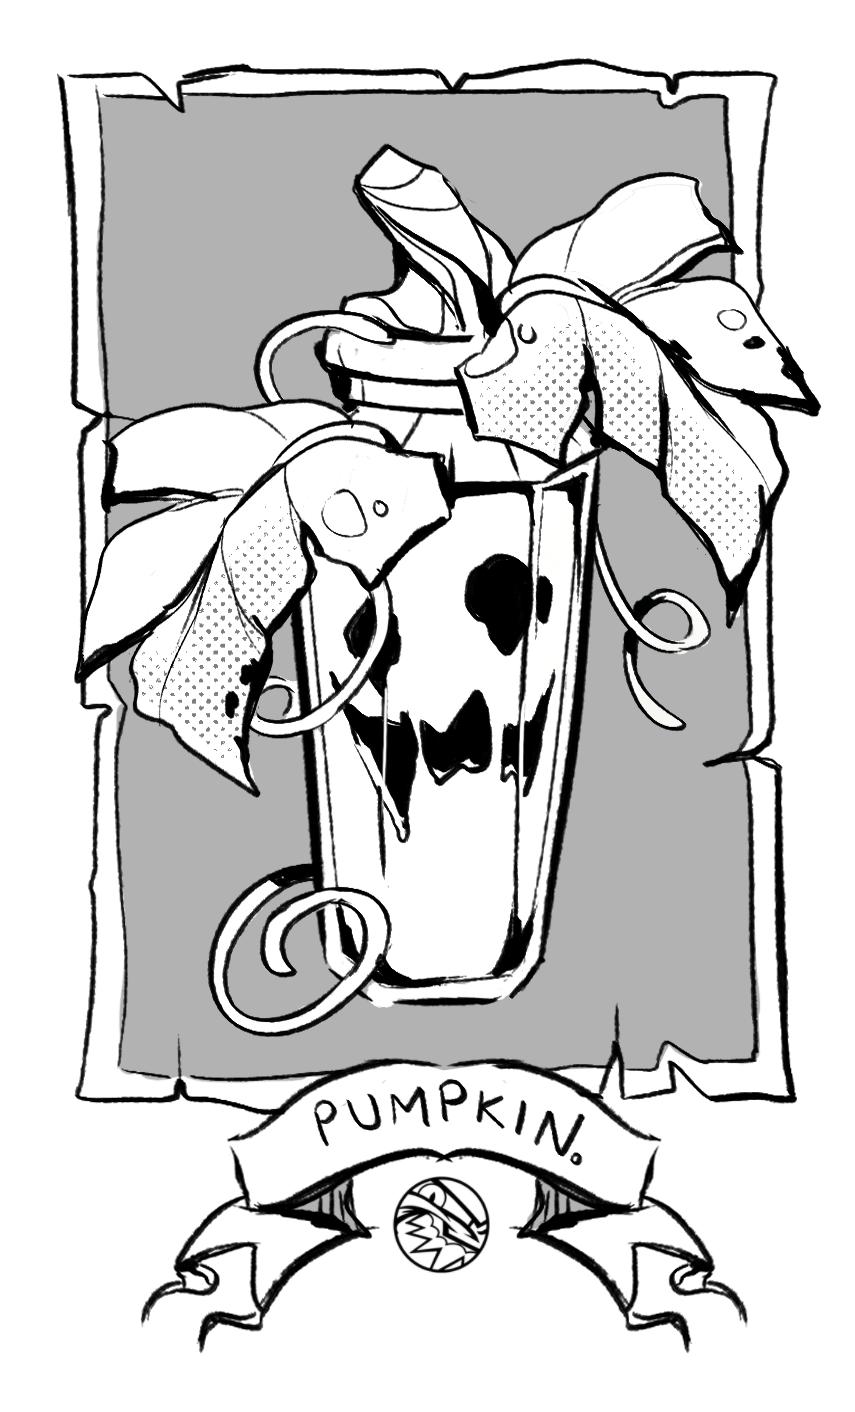 HALLOWEEN | Pumpkin Vial | FEARDAKEZ